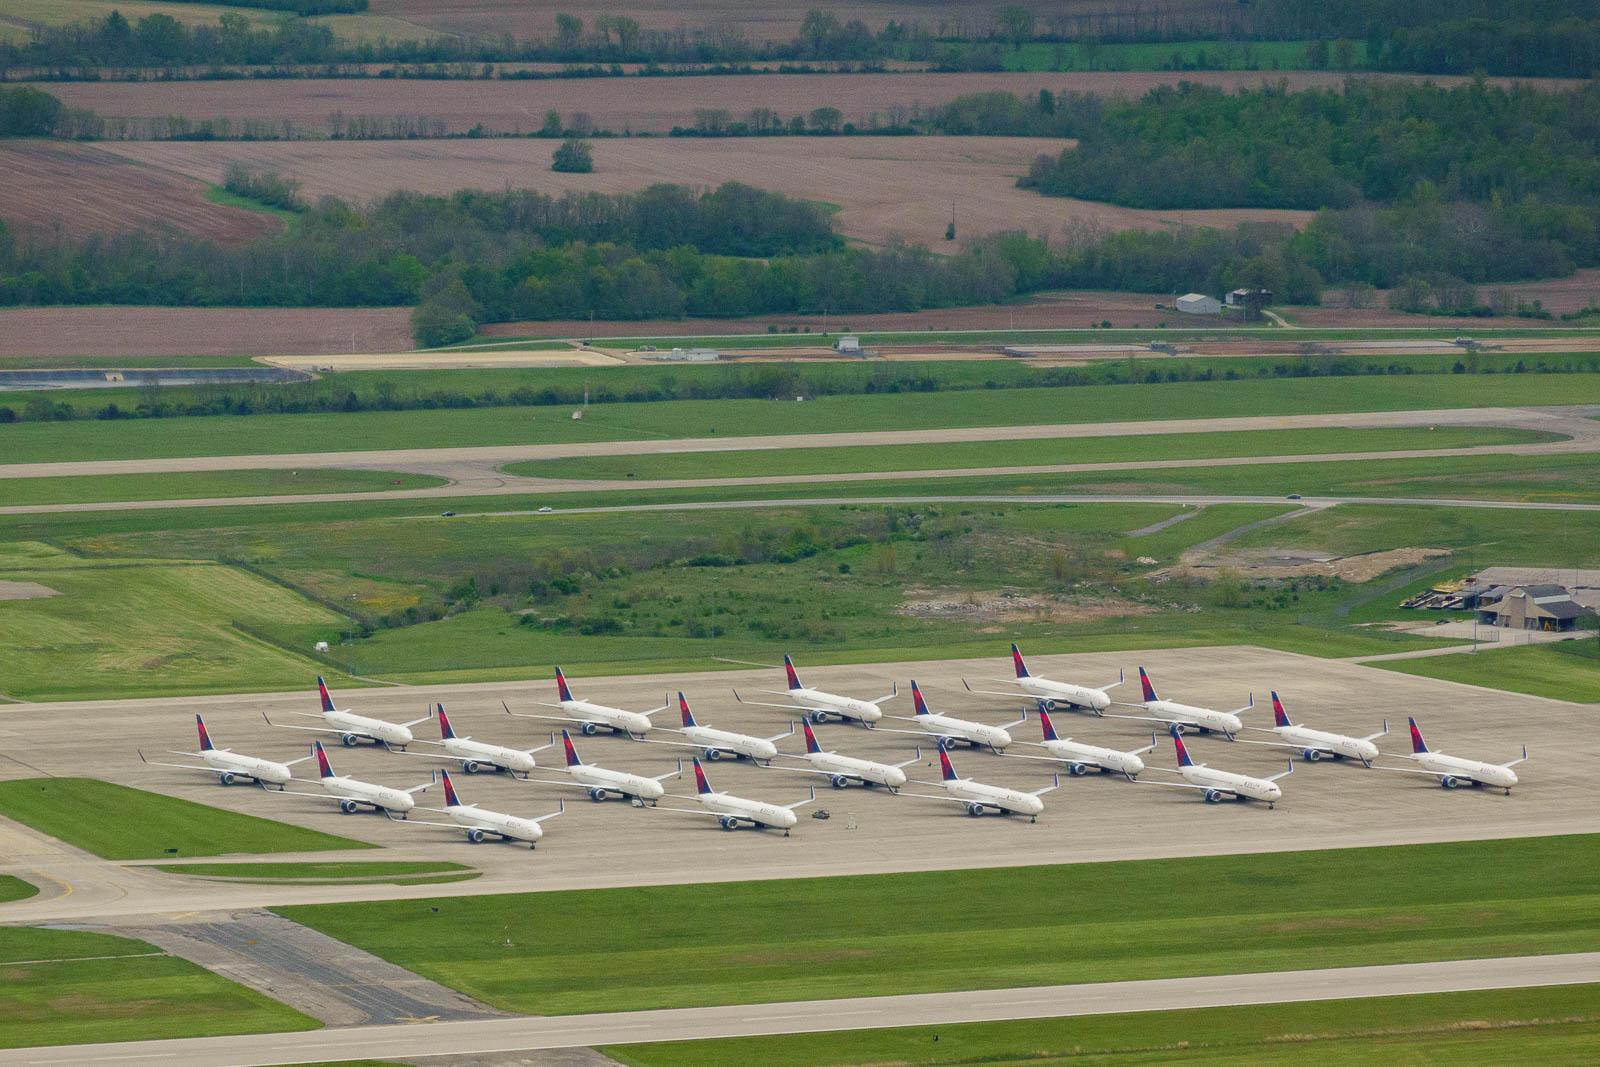 Delta airplane storage at Wilmington, IN